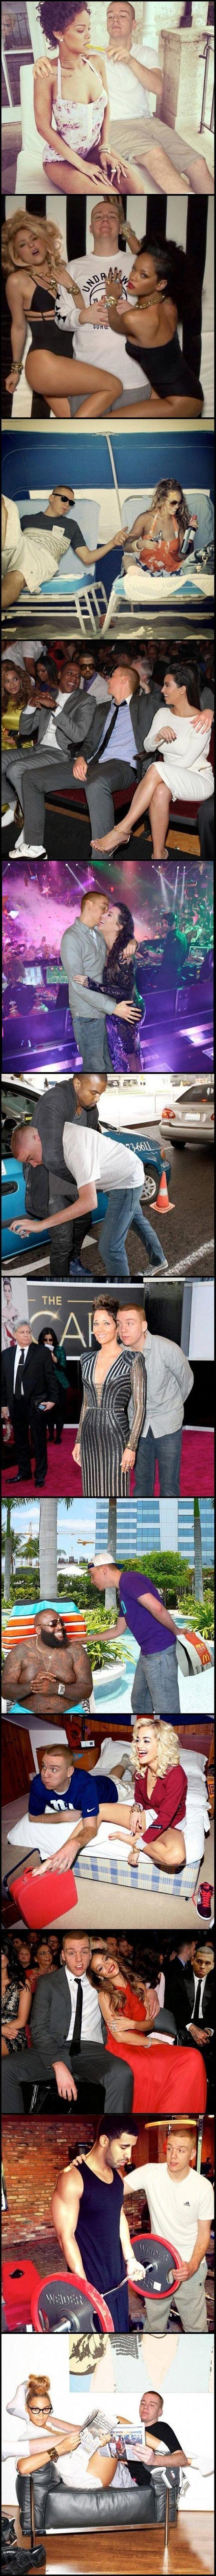 This Guy Has Some Amazing Photoshop Skills... #lol #haha #funny